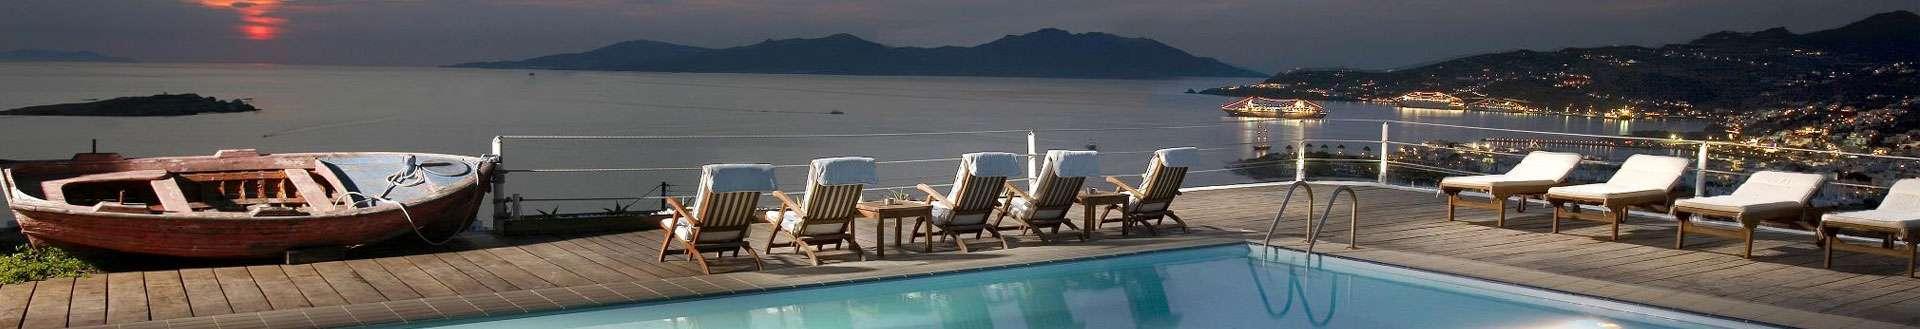 Mykonos Resort and Spa Hotels